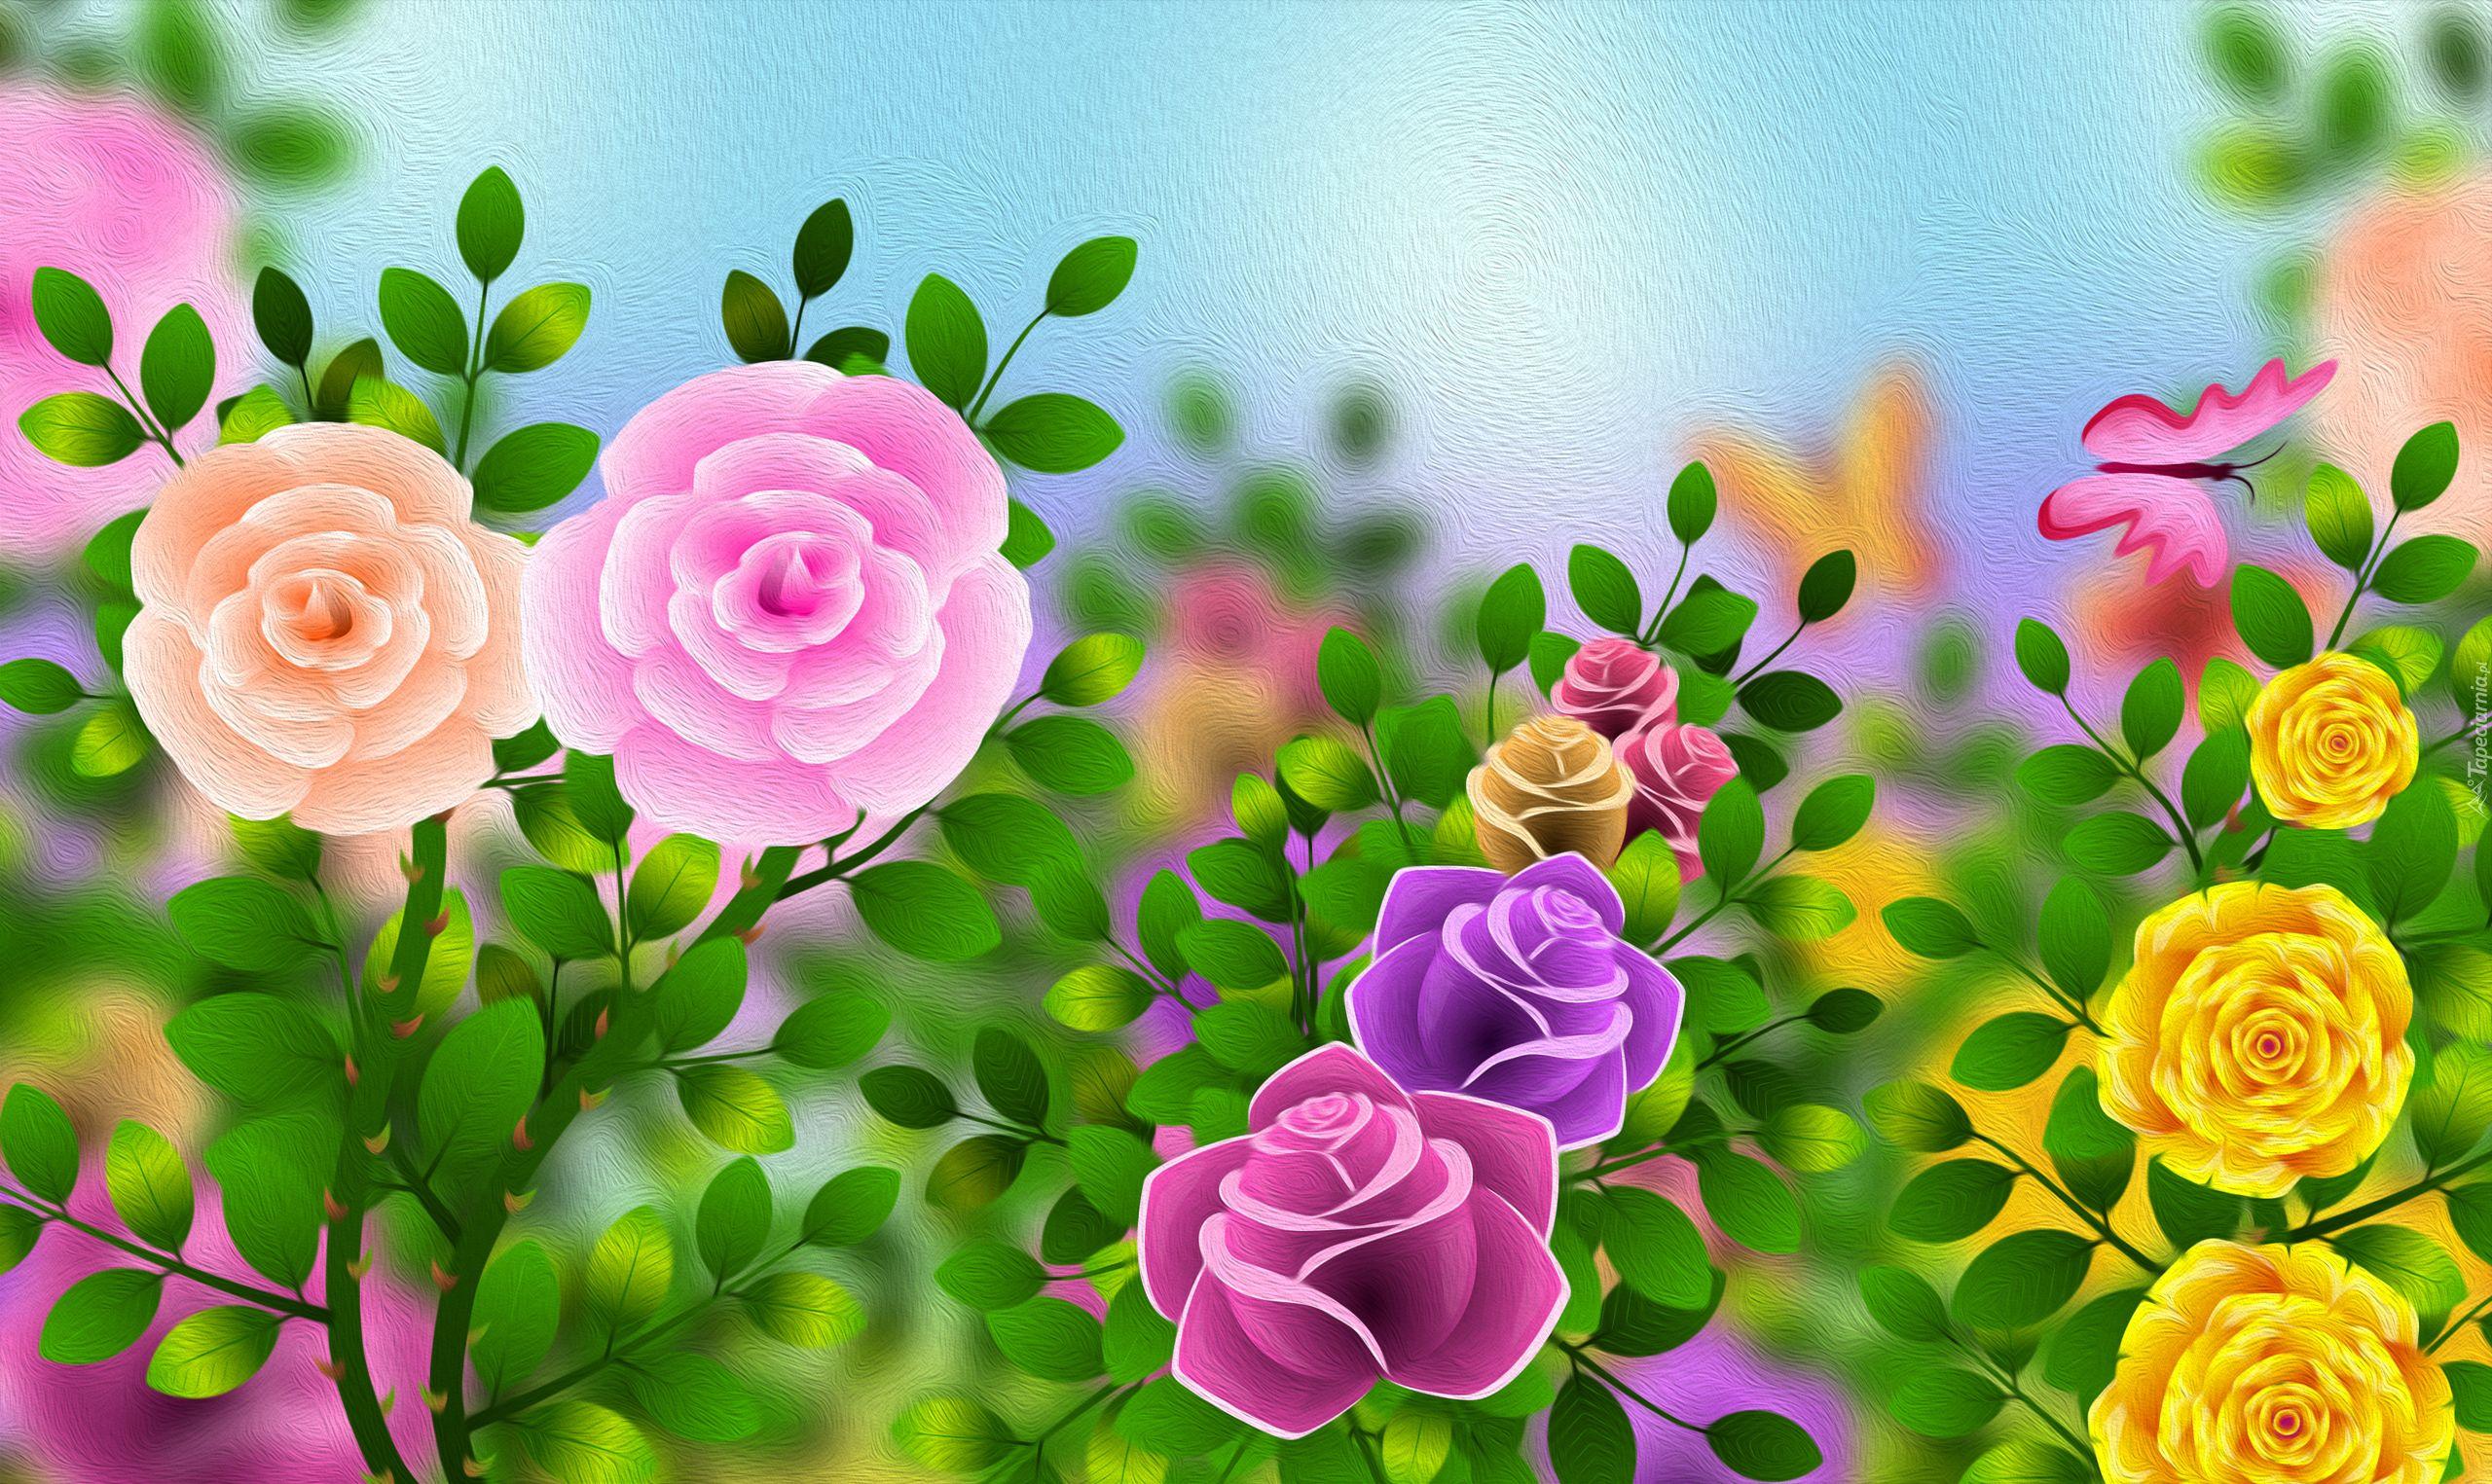 Kwiaty Grafika 2d Flowers Wallpaper Background Images